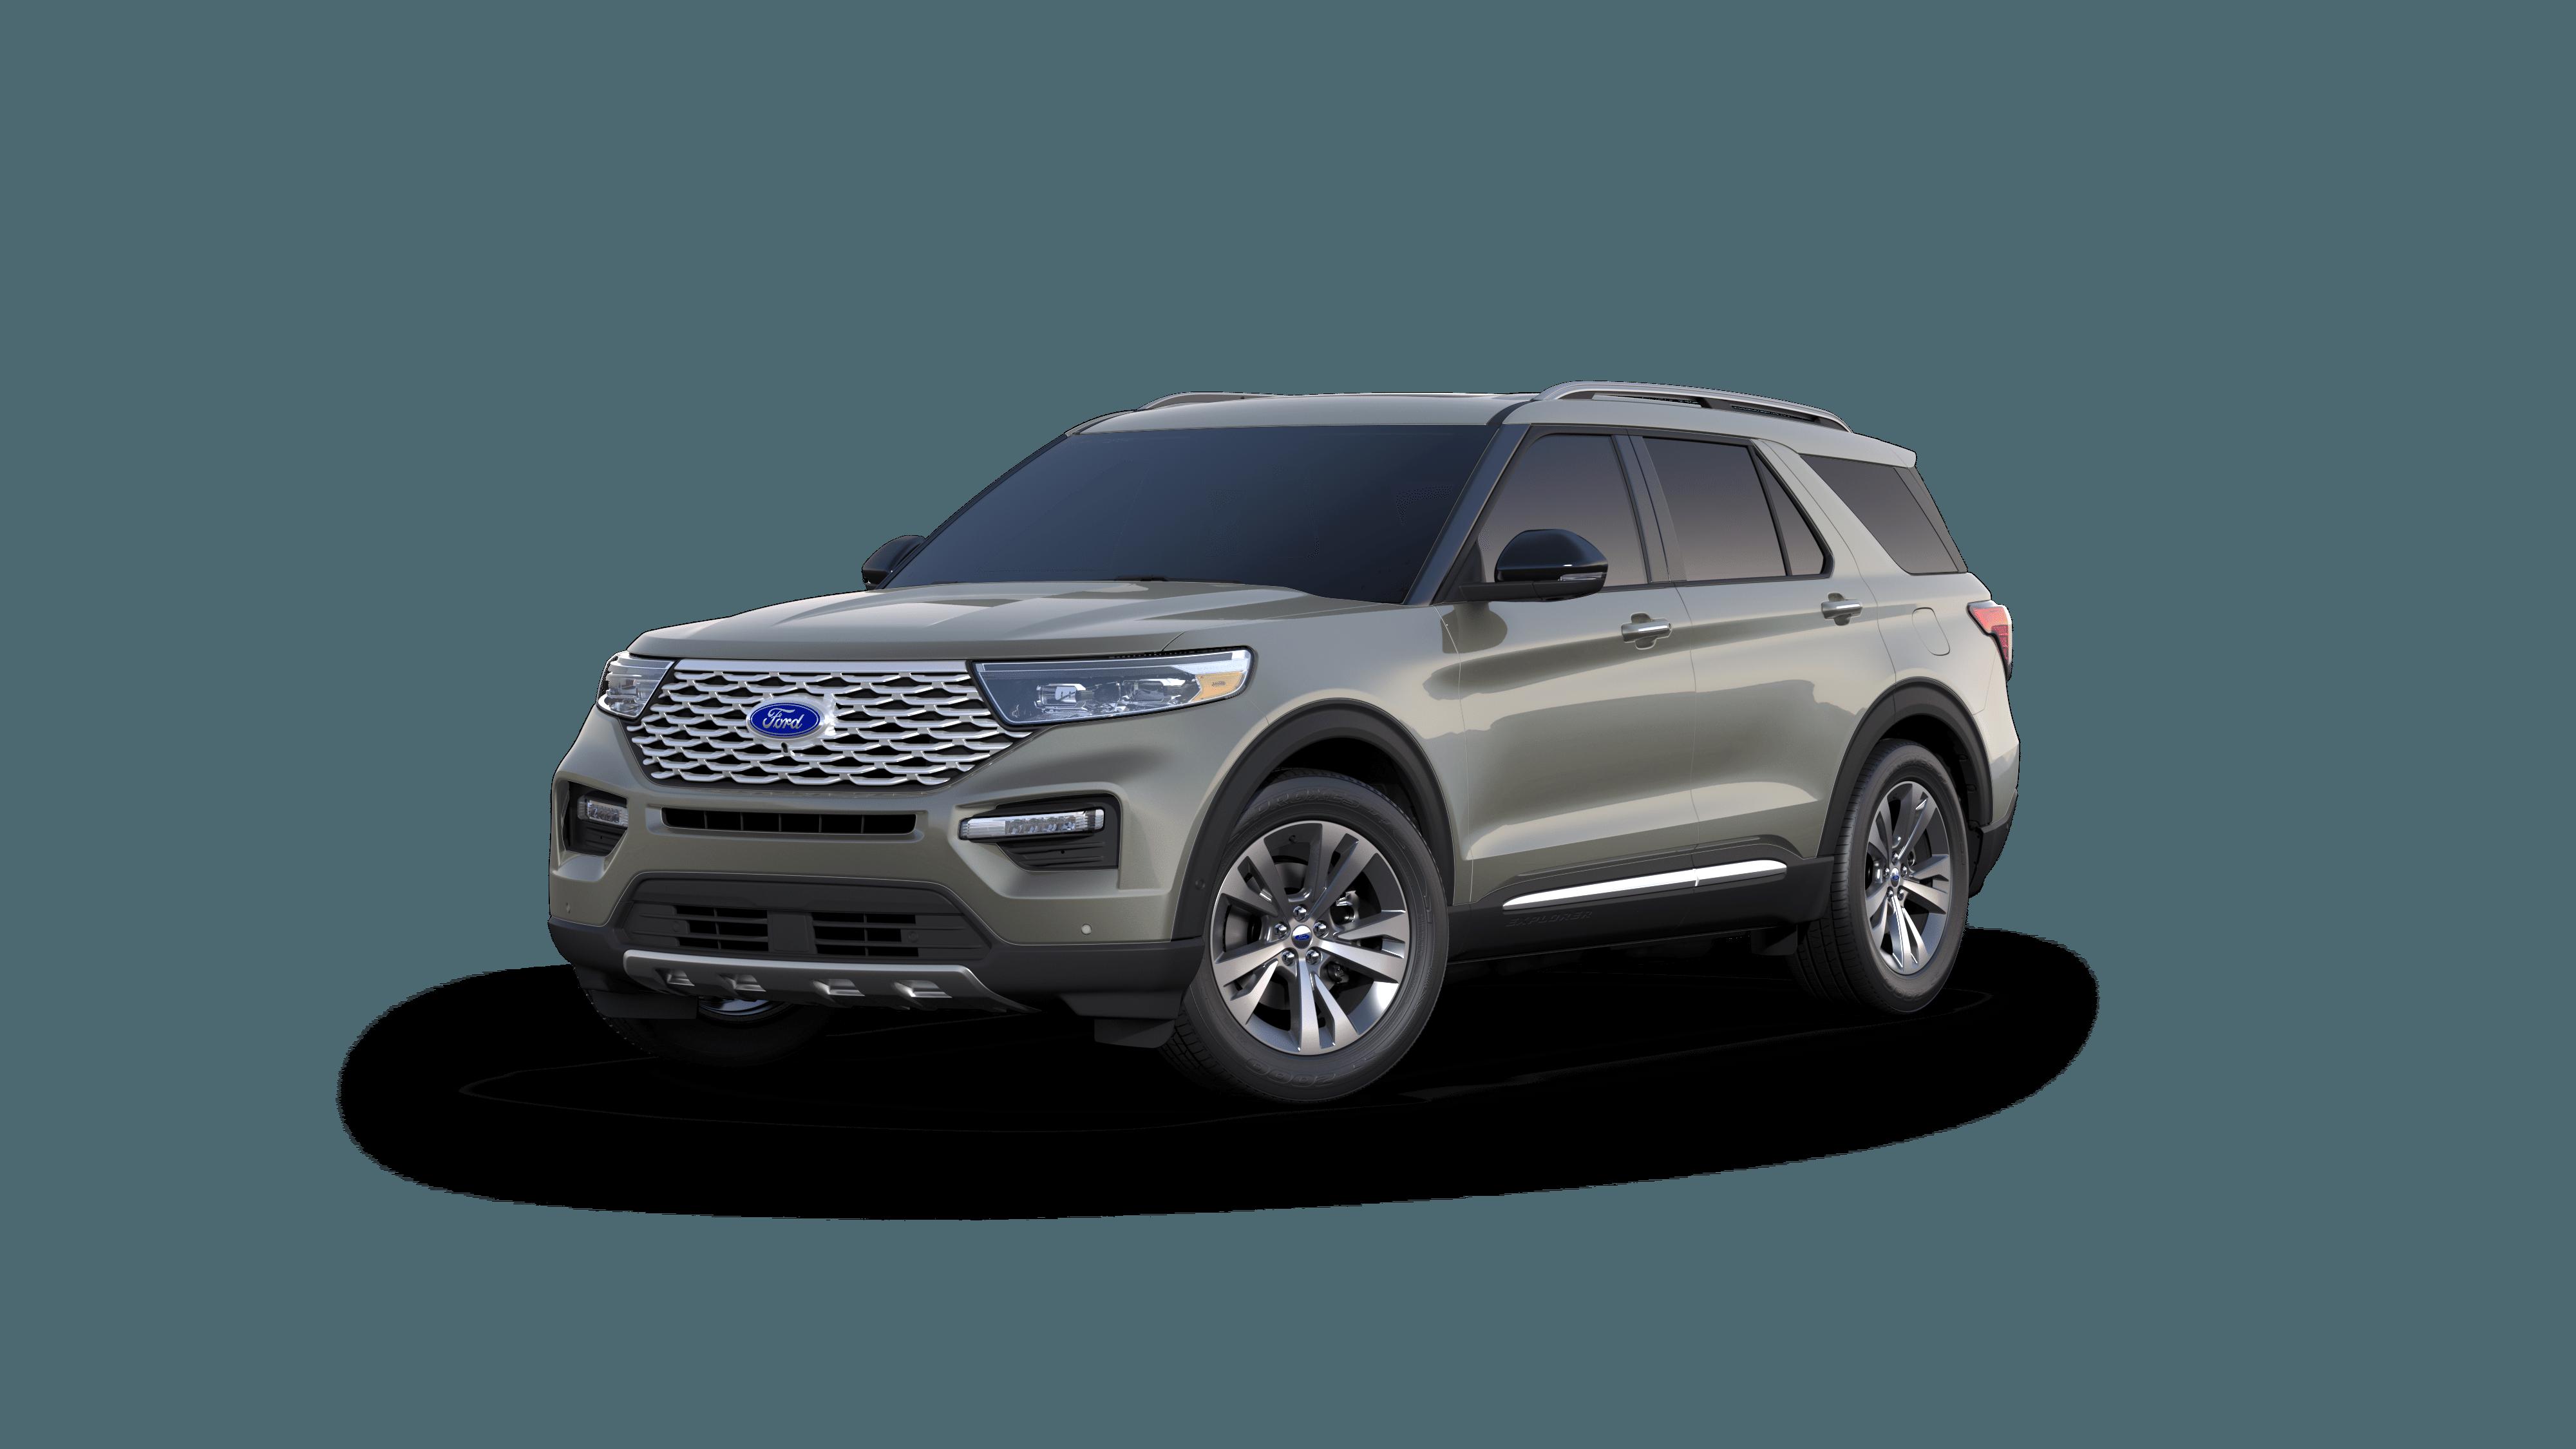 2020 Ford Explorer For Sale In Jacksonville Crain Ford Jacksonville Serving Little Rock Sherwood Cabot